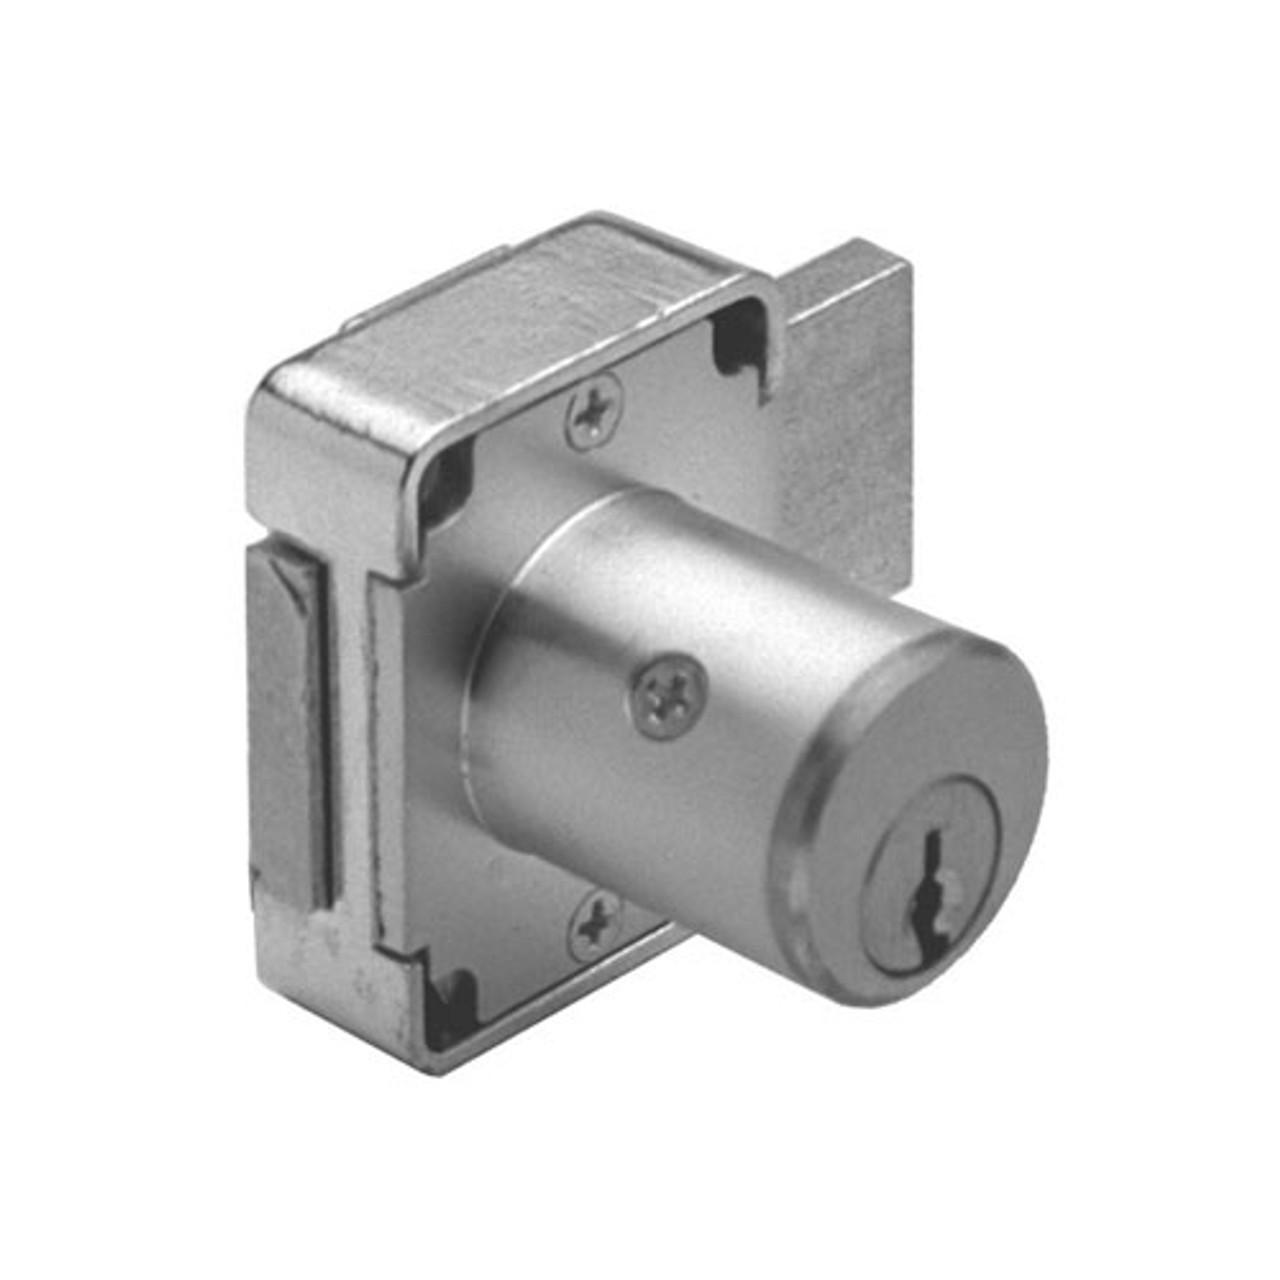 Olympus 100DR-KA103-26D-7/8 Deadbolt Locks in Satin Chrome Finish